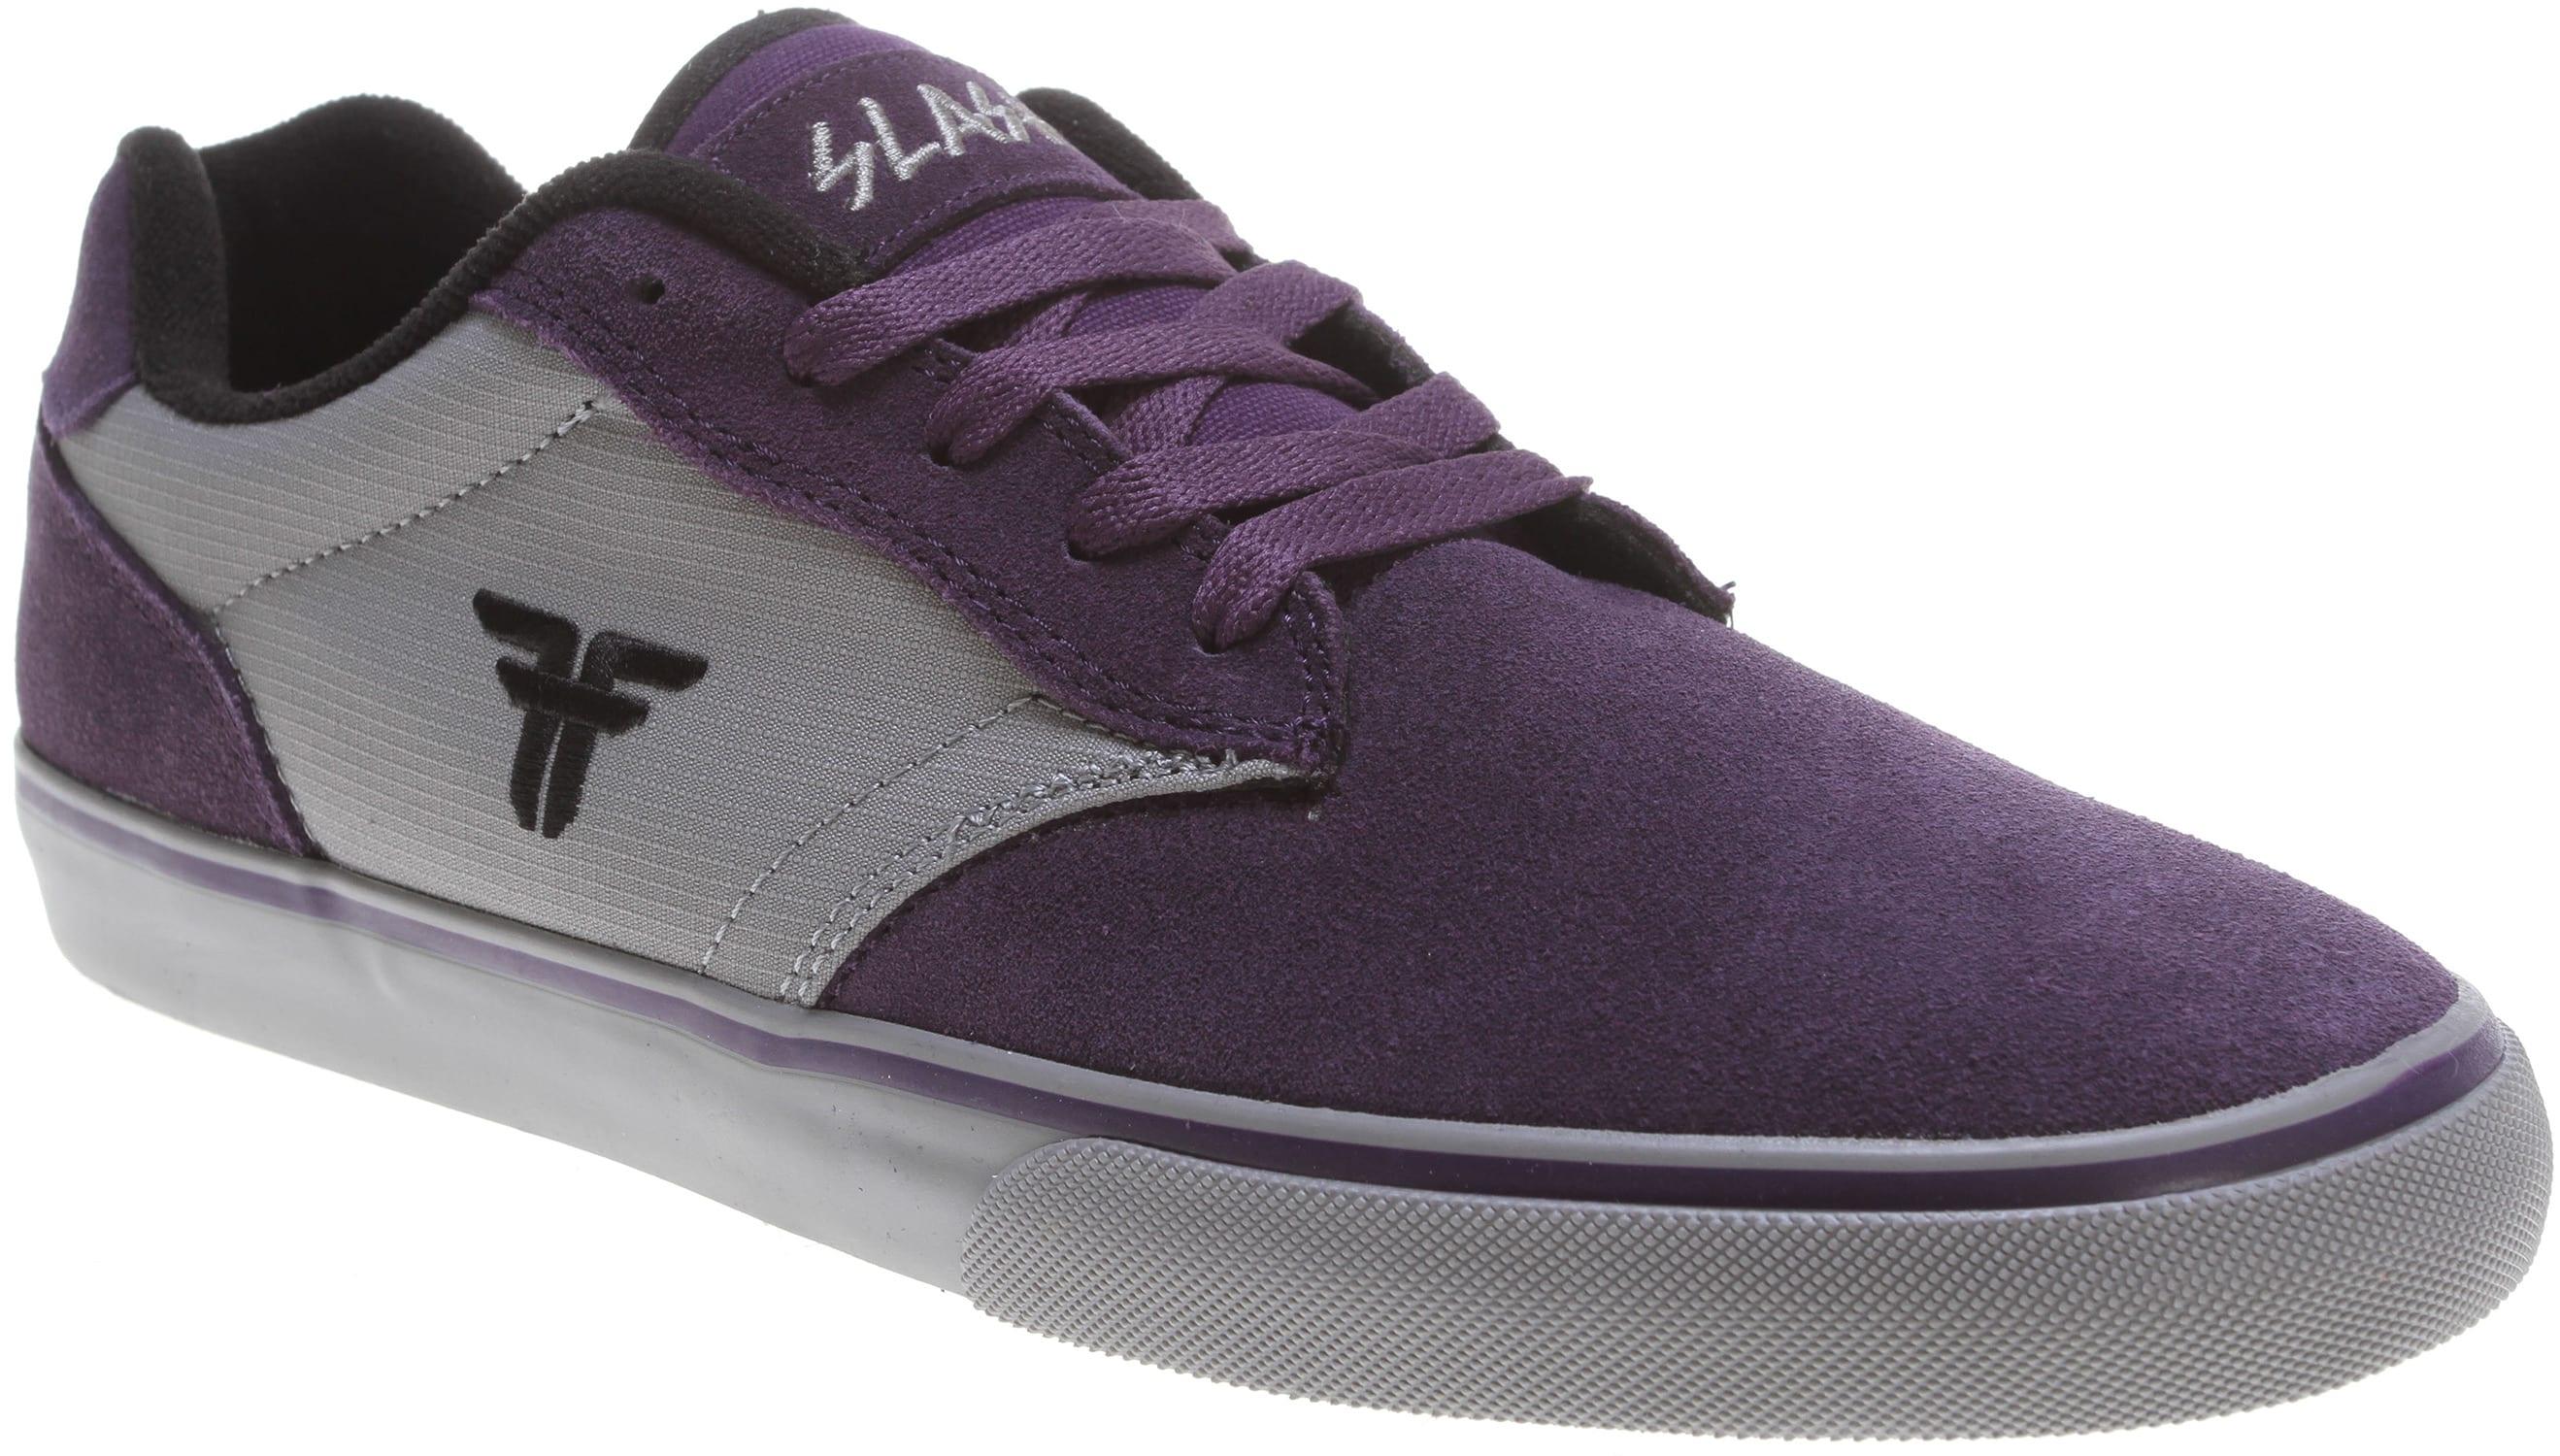 21f3b6c2f2 Fallen Slash Skate Shoes - thumbnail 2